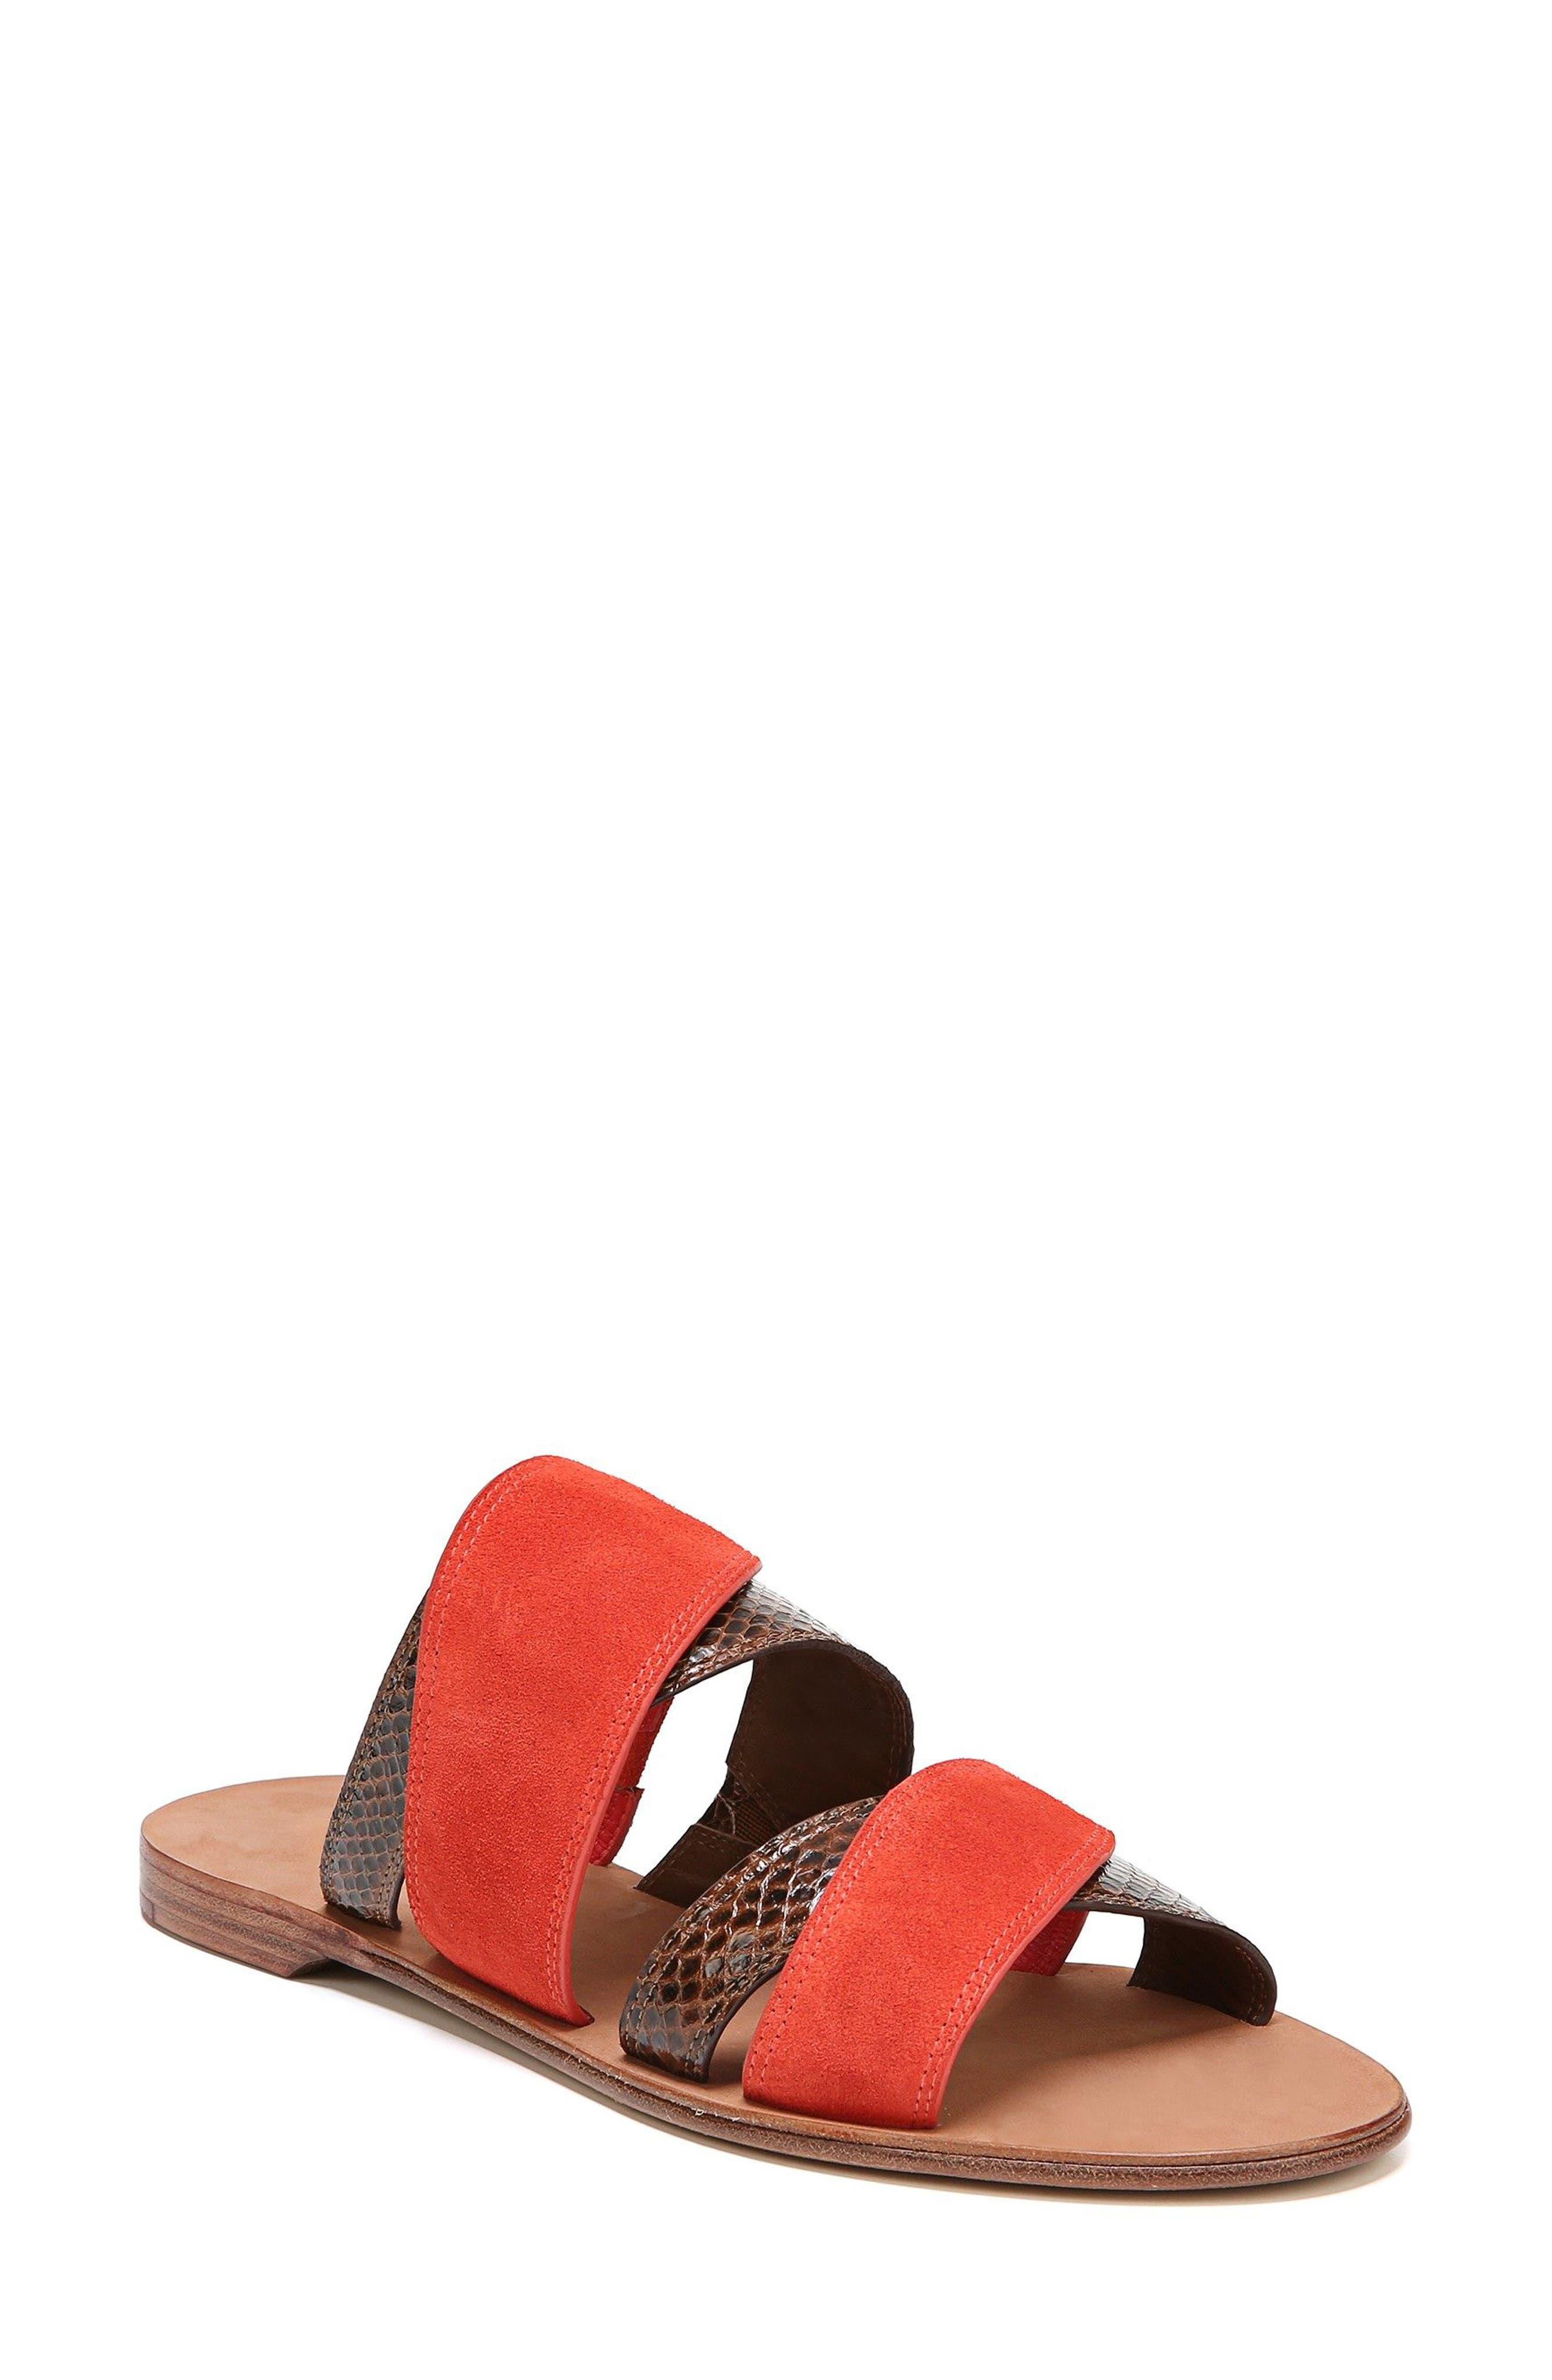 Diane von Furstenberg Blake Cross Strap Slide Sandal (Women)